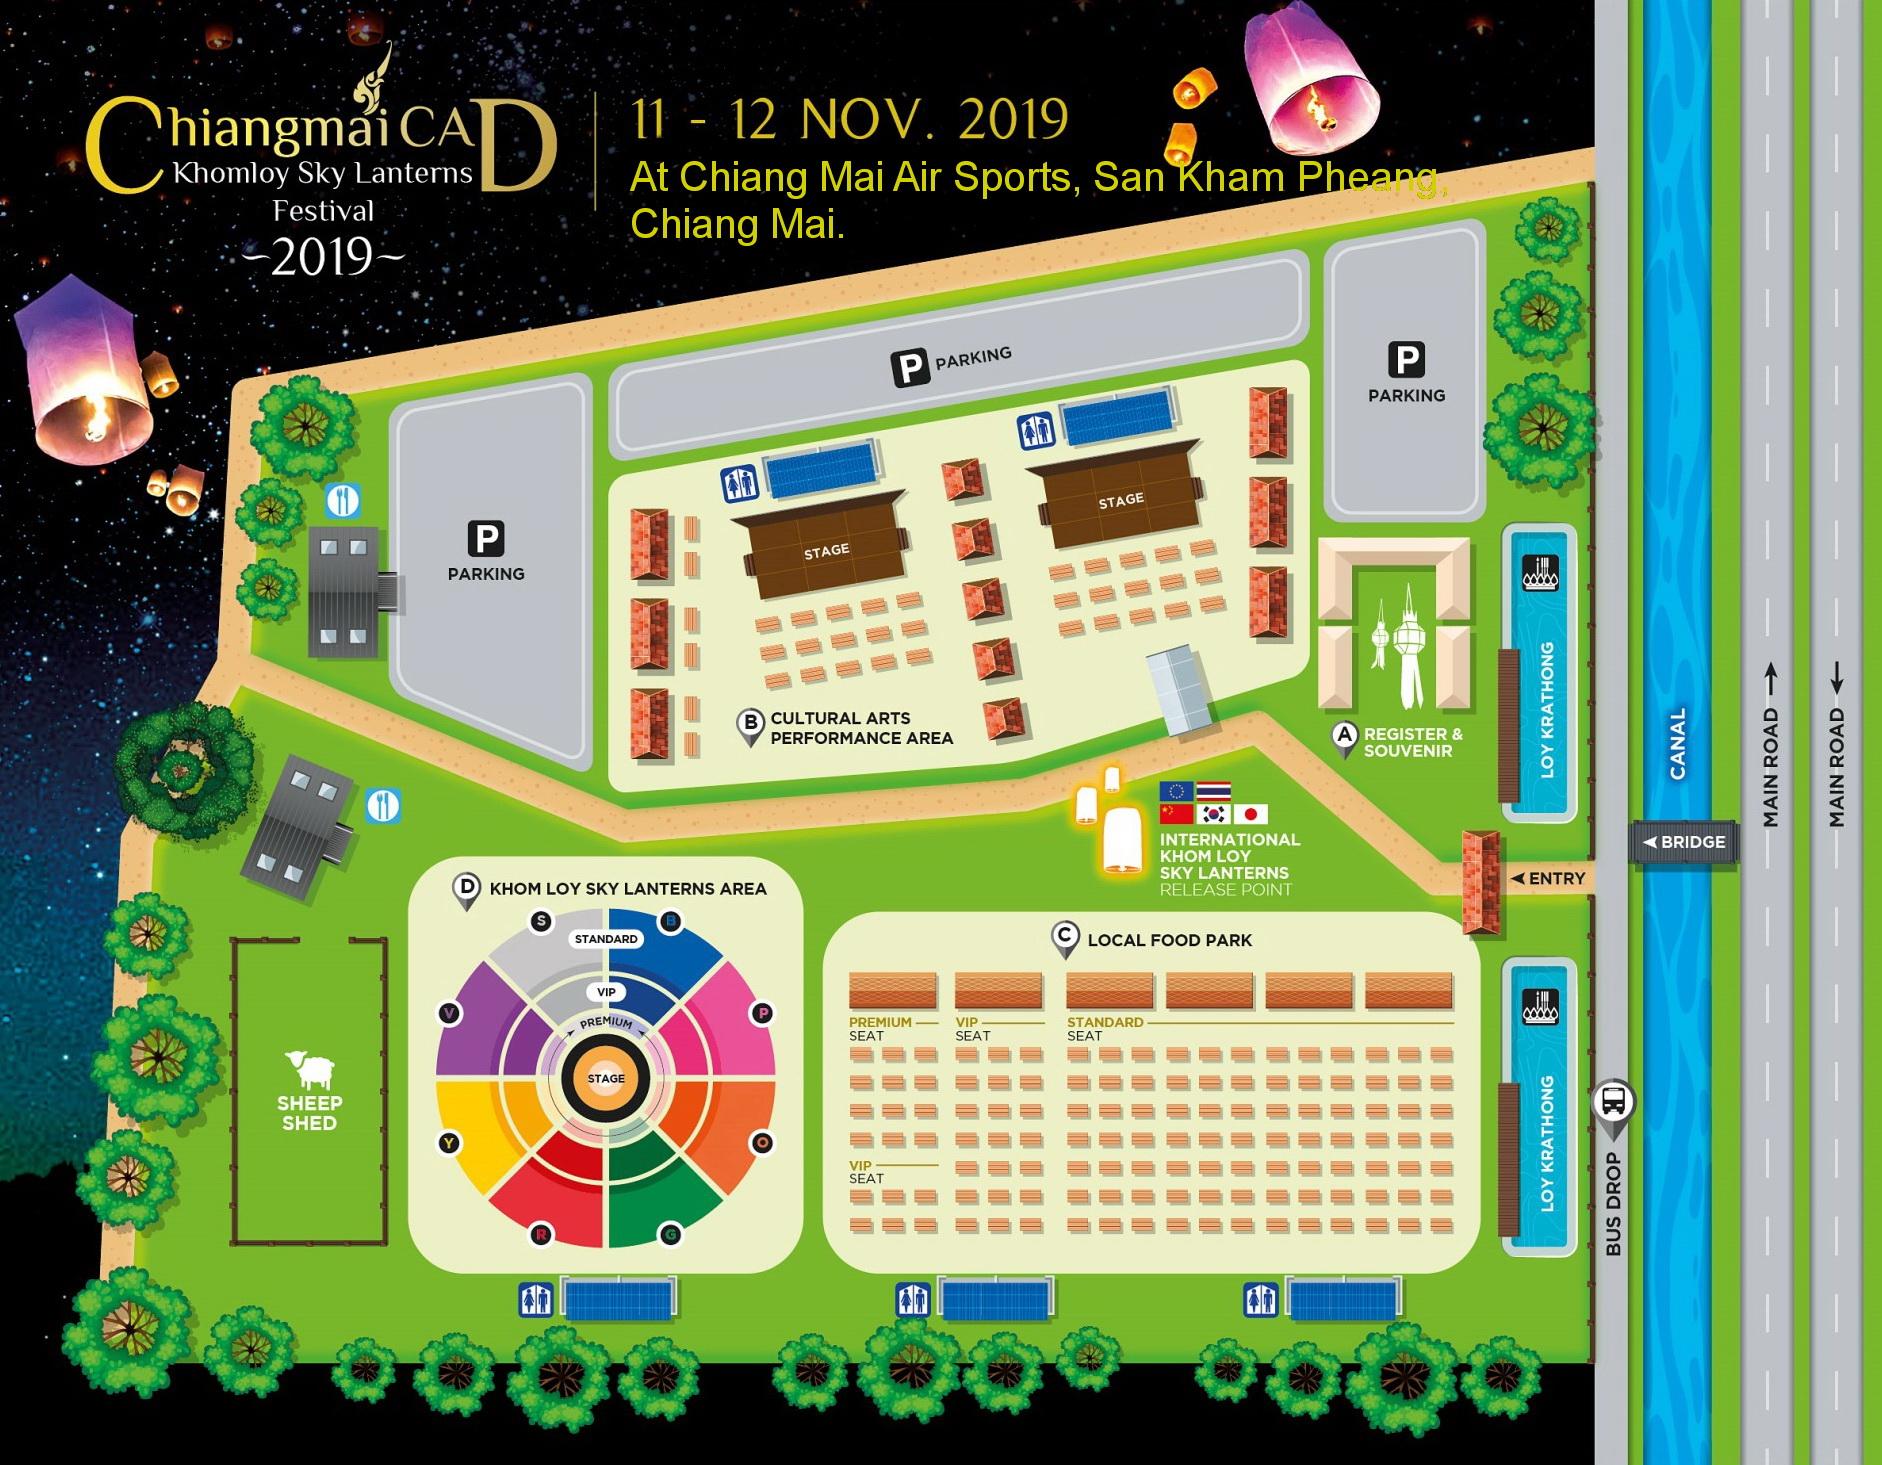 chiang mai khomloy sky lanterns festival 2019, sky lanterns festival 2019, yi peng 2019, yi peng festival, yi peng festival 2019